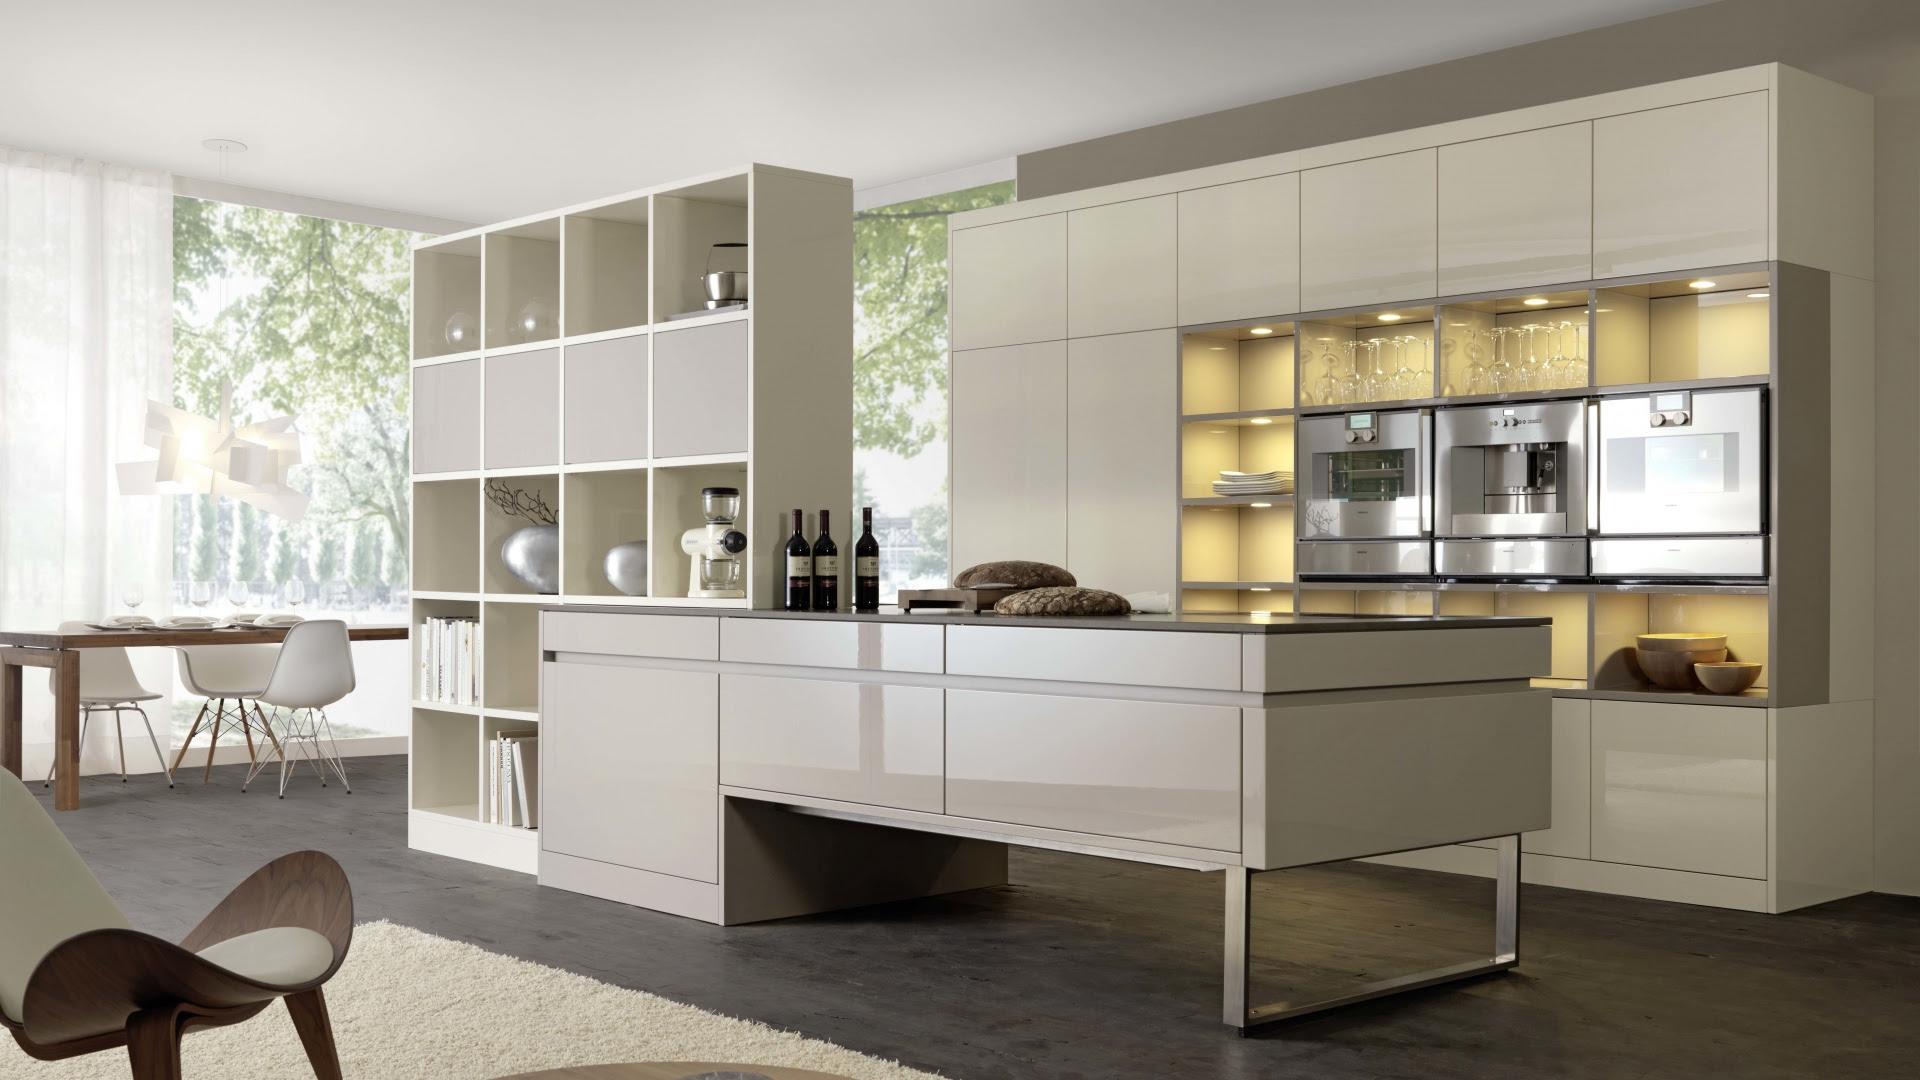 Home Architec Ideas Kitchen Interior Design Images Hd